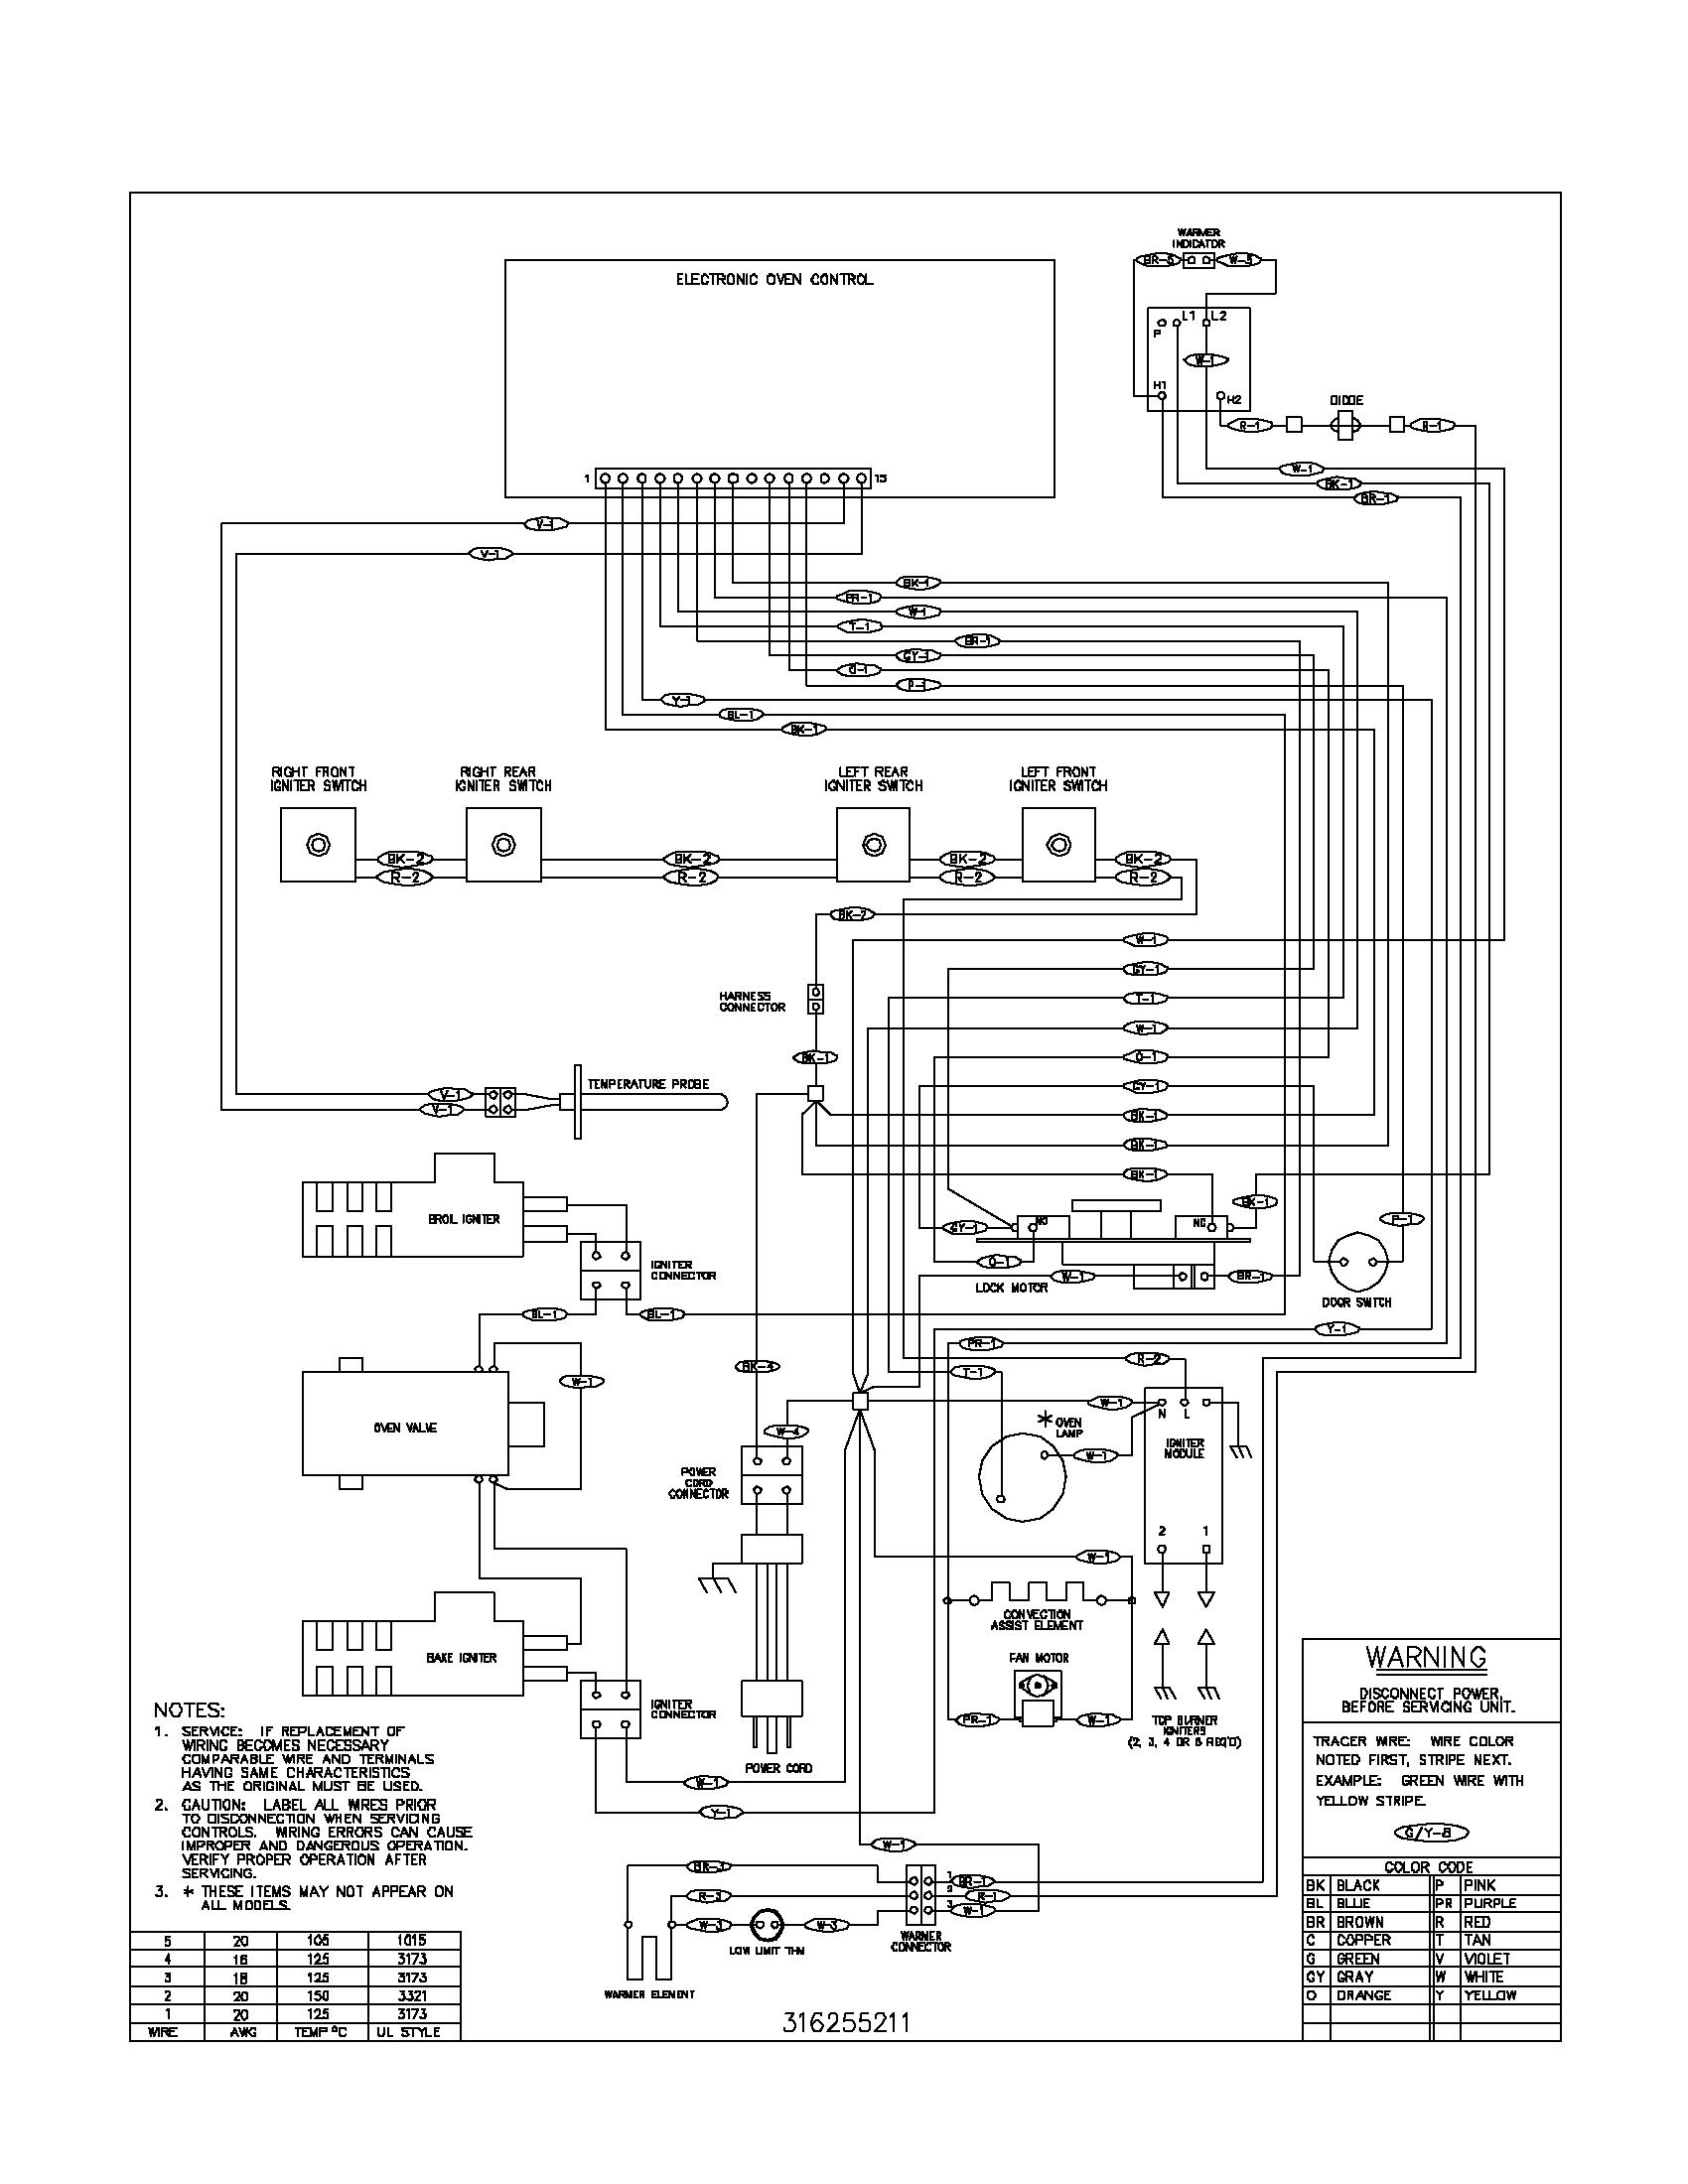 wiring diagram parts?resize\\\=665%2C861\\\&ssl\\\=1 kubota m5700 wiring diagram kubota b7500 specs, kubota l2850 kubota kx121 3 wiring diagram at eliteediting.co